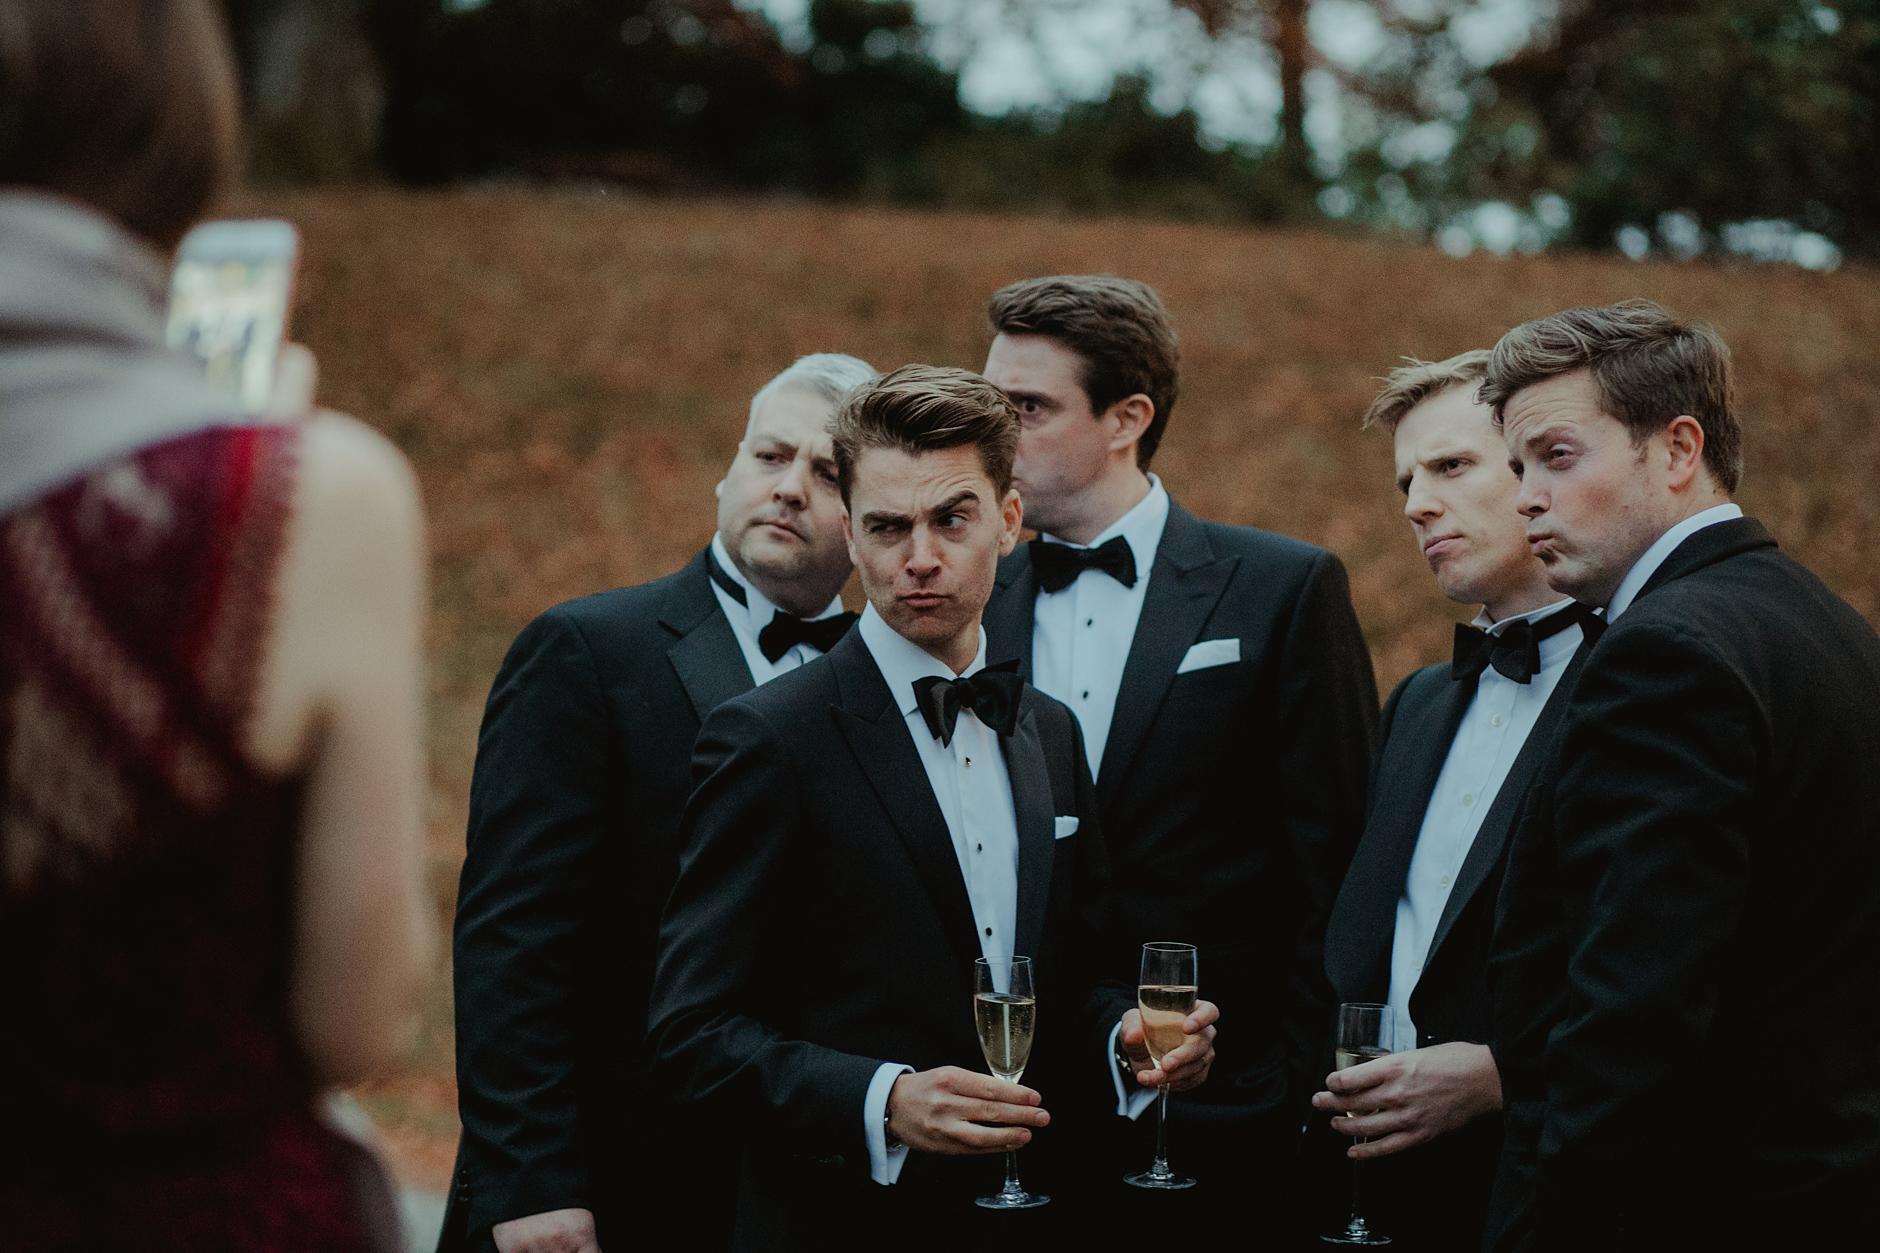 Glentruim-Wedding-Nikki-Leadbetter-Photography-233.jpg